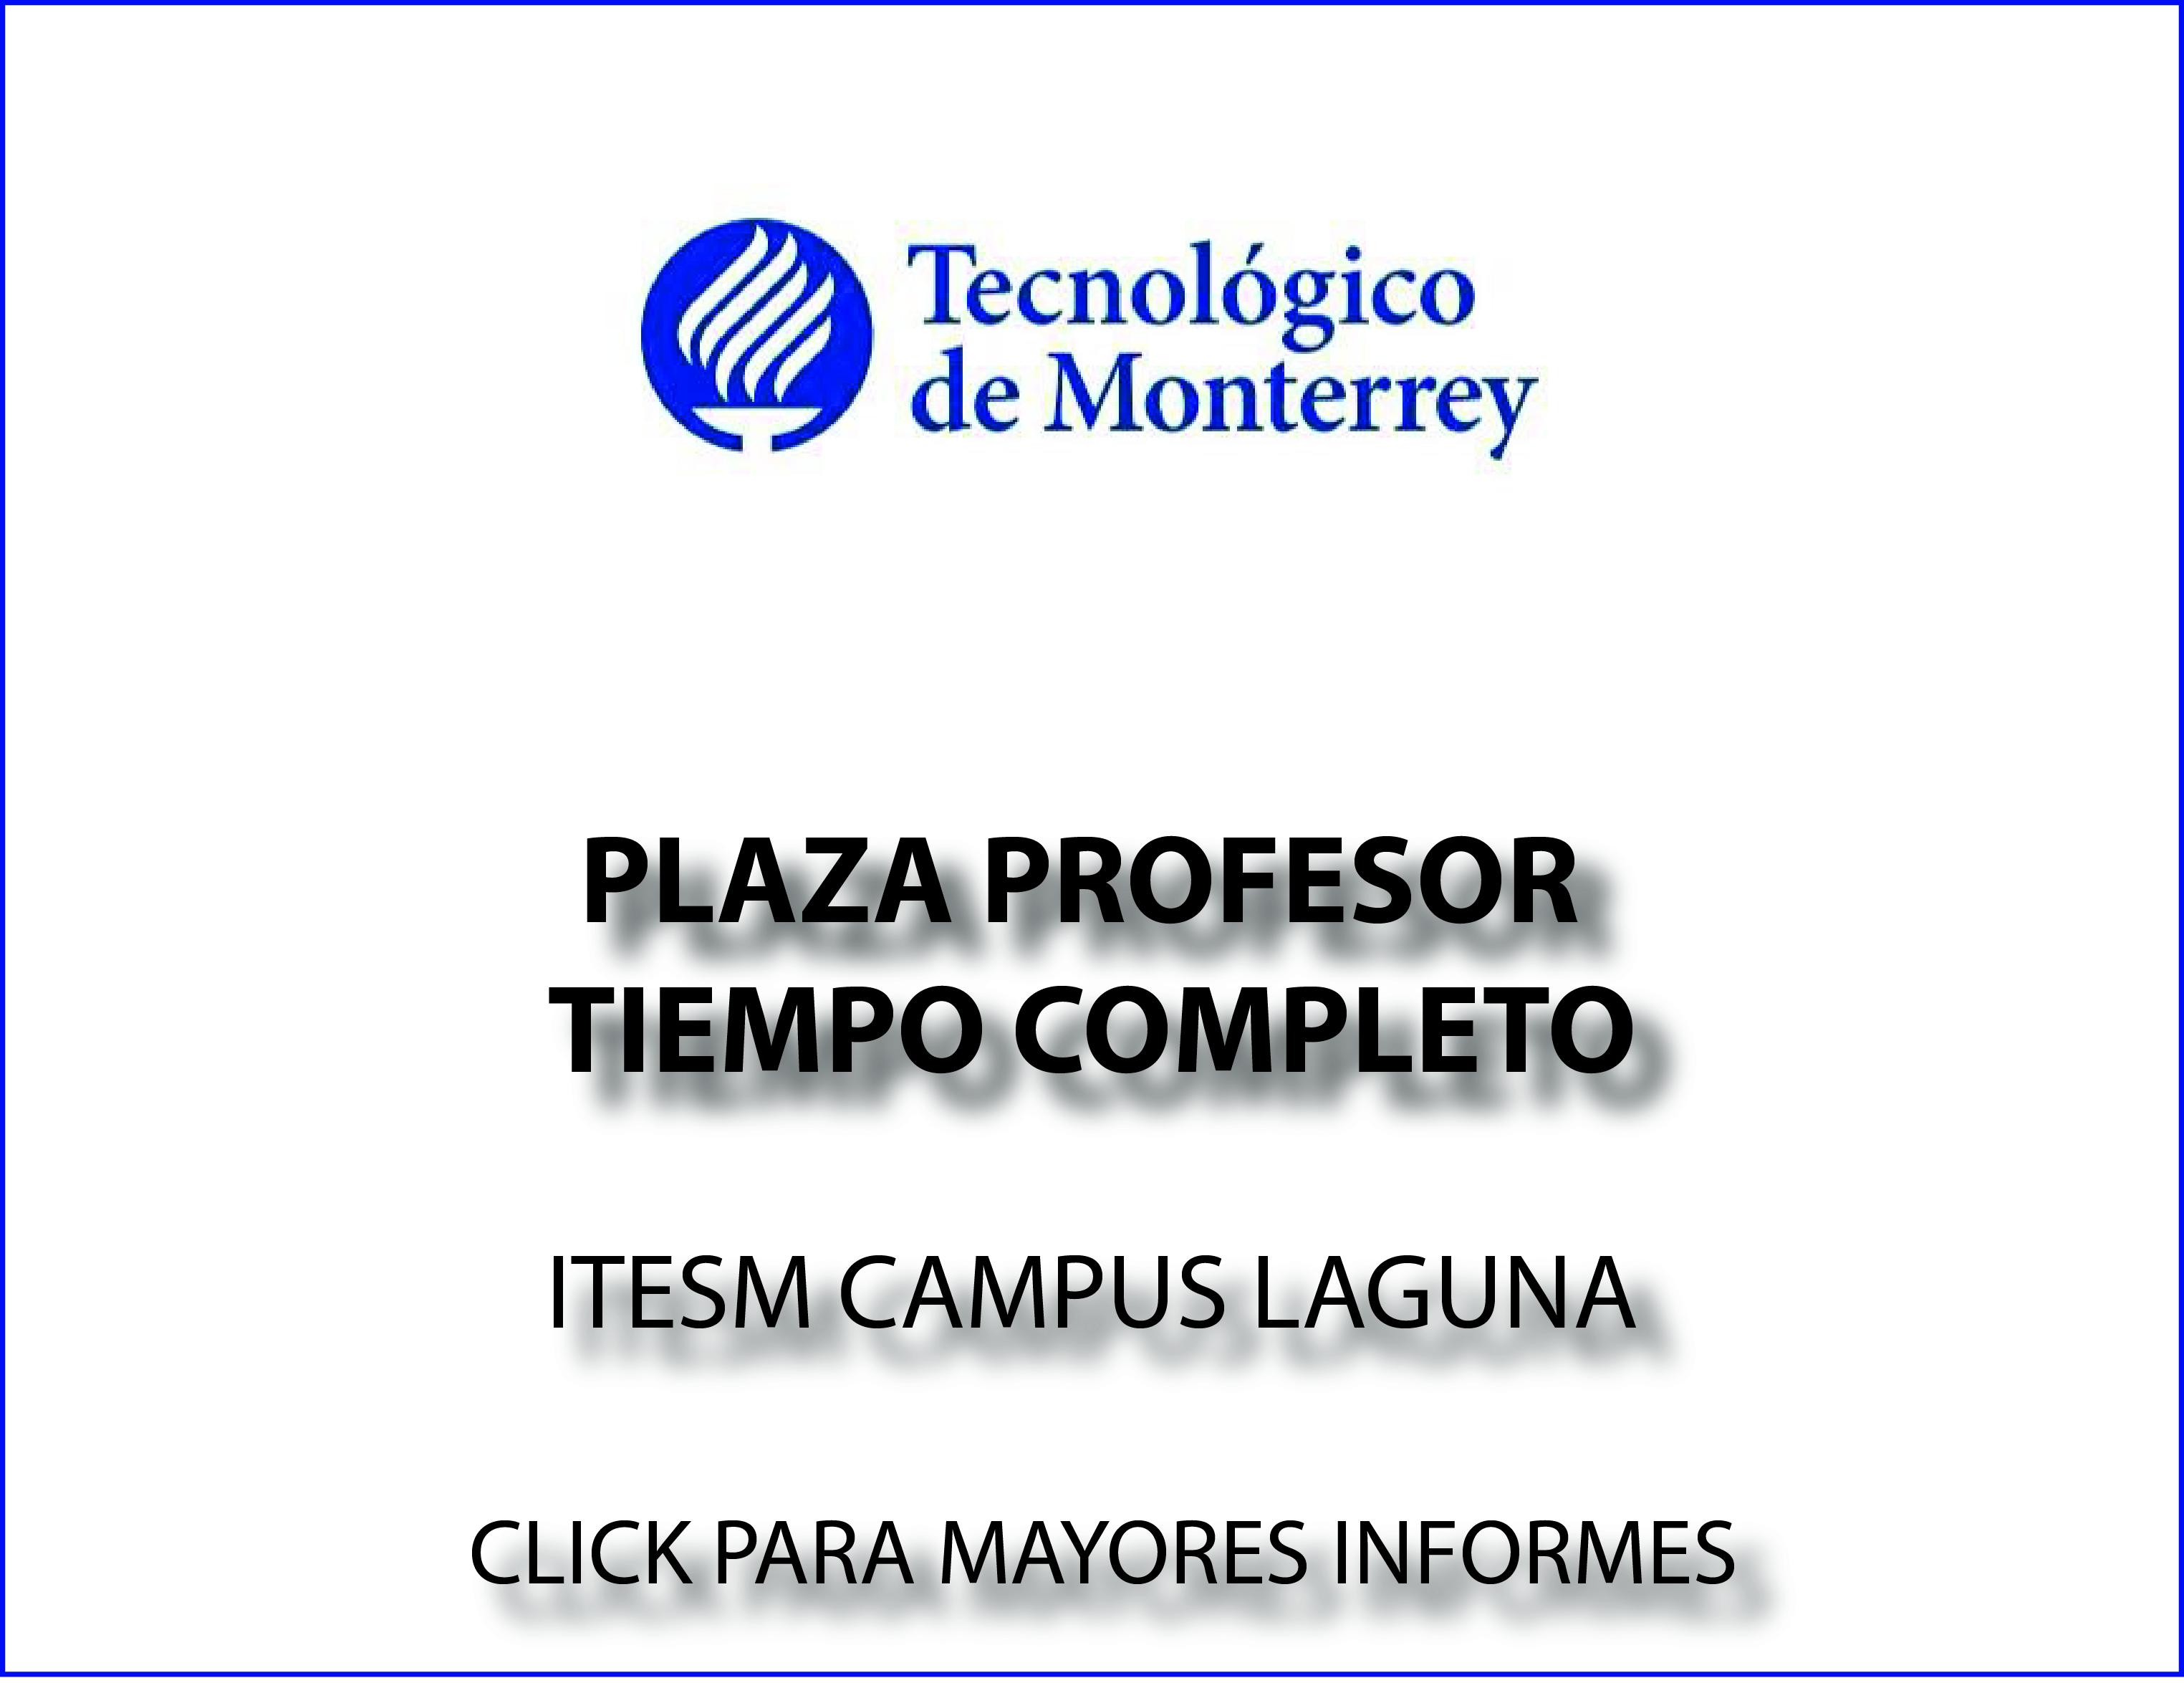 PTC ITESM